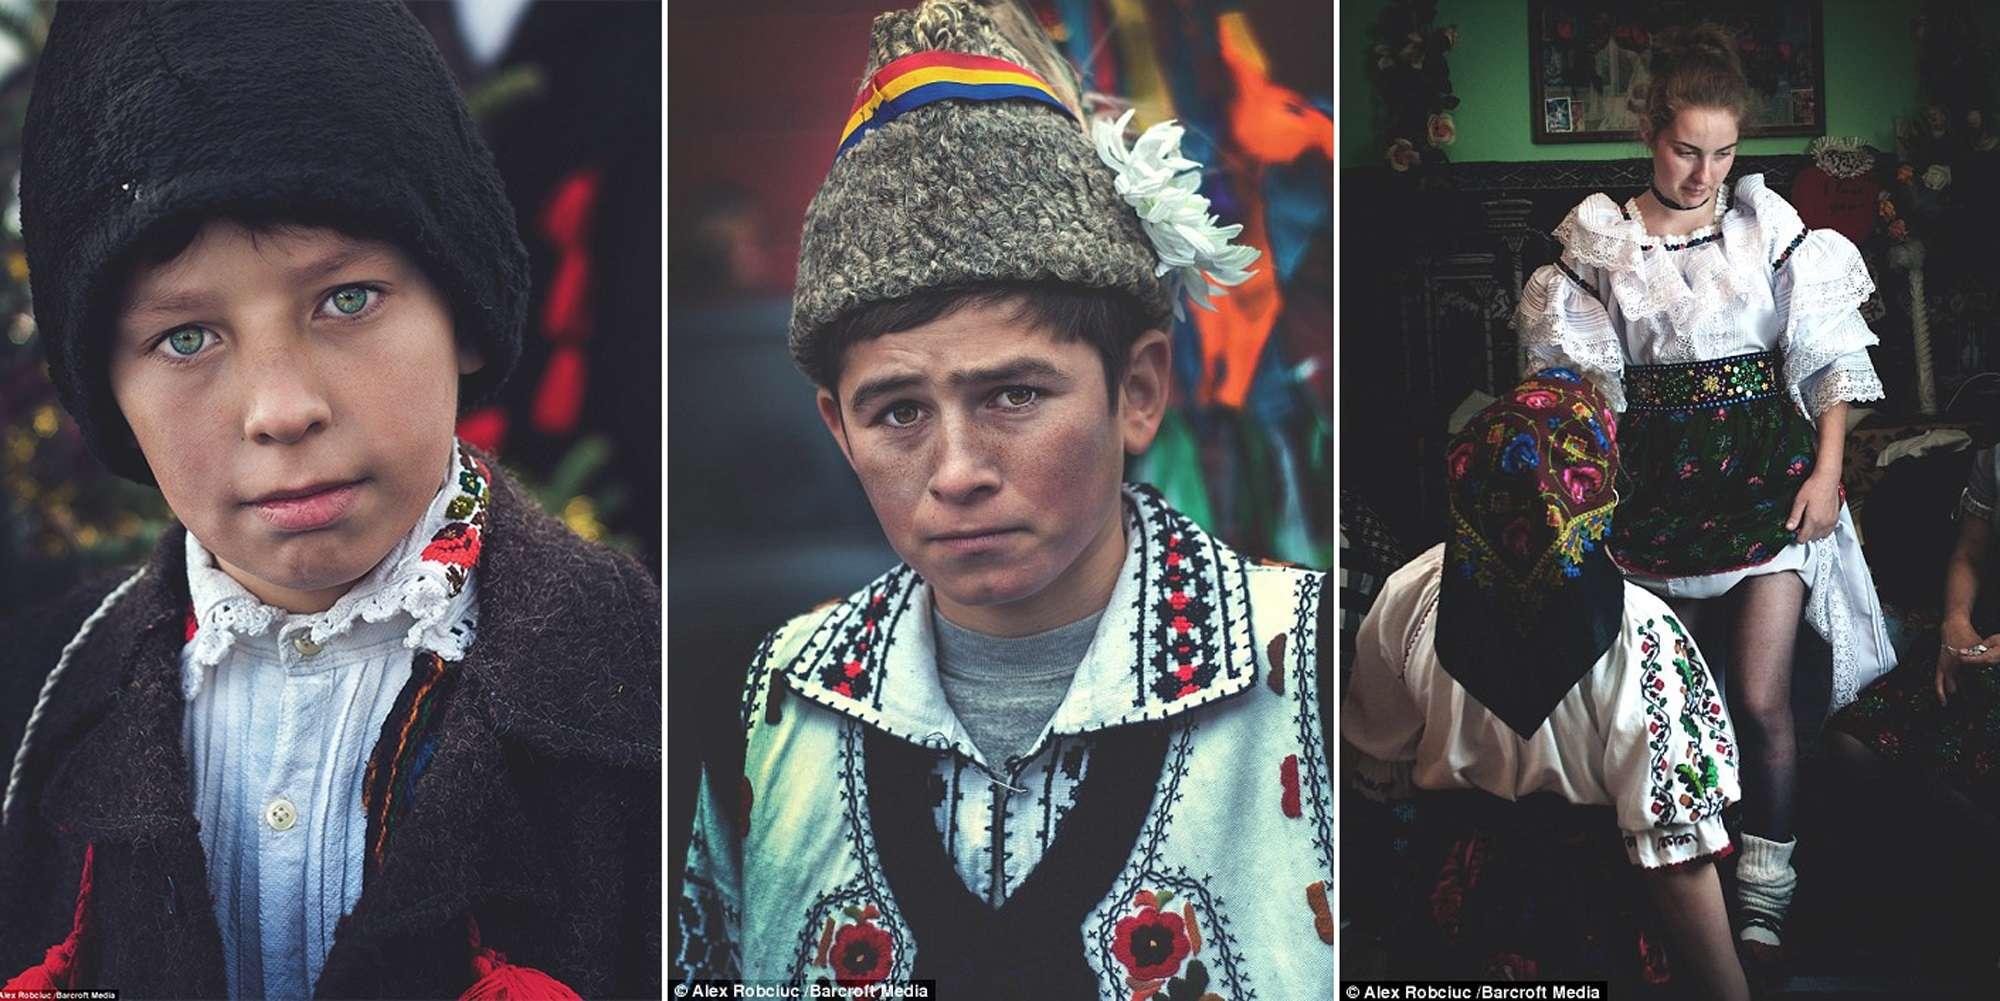 Romanian dating customs